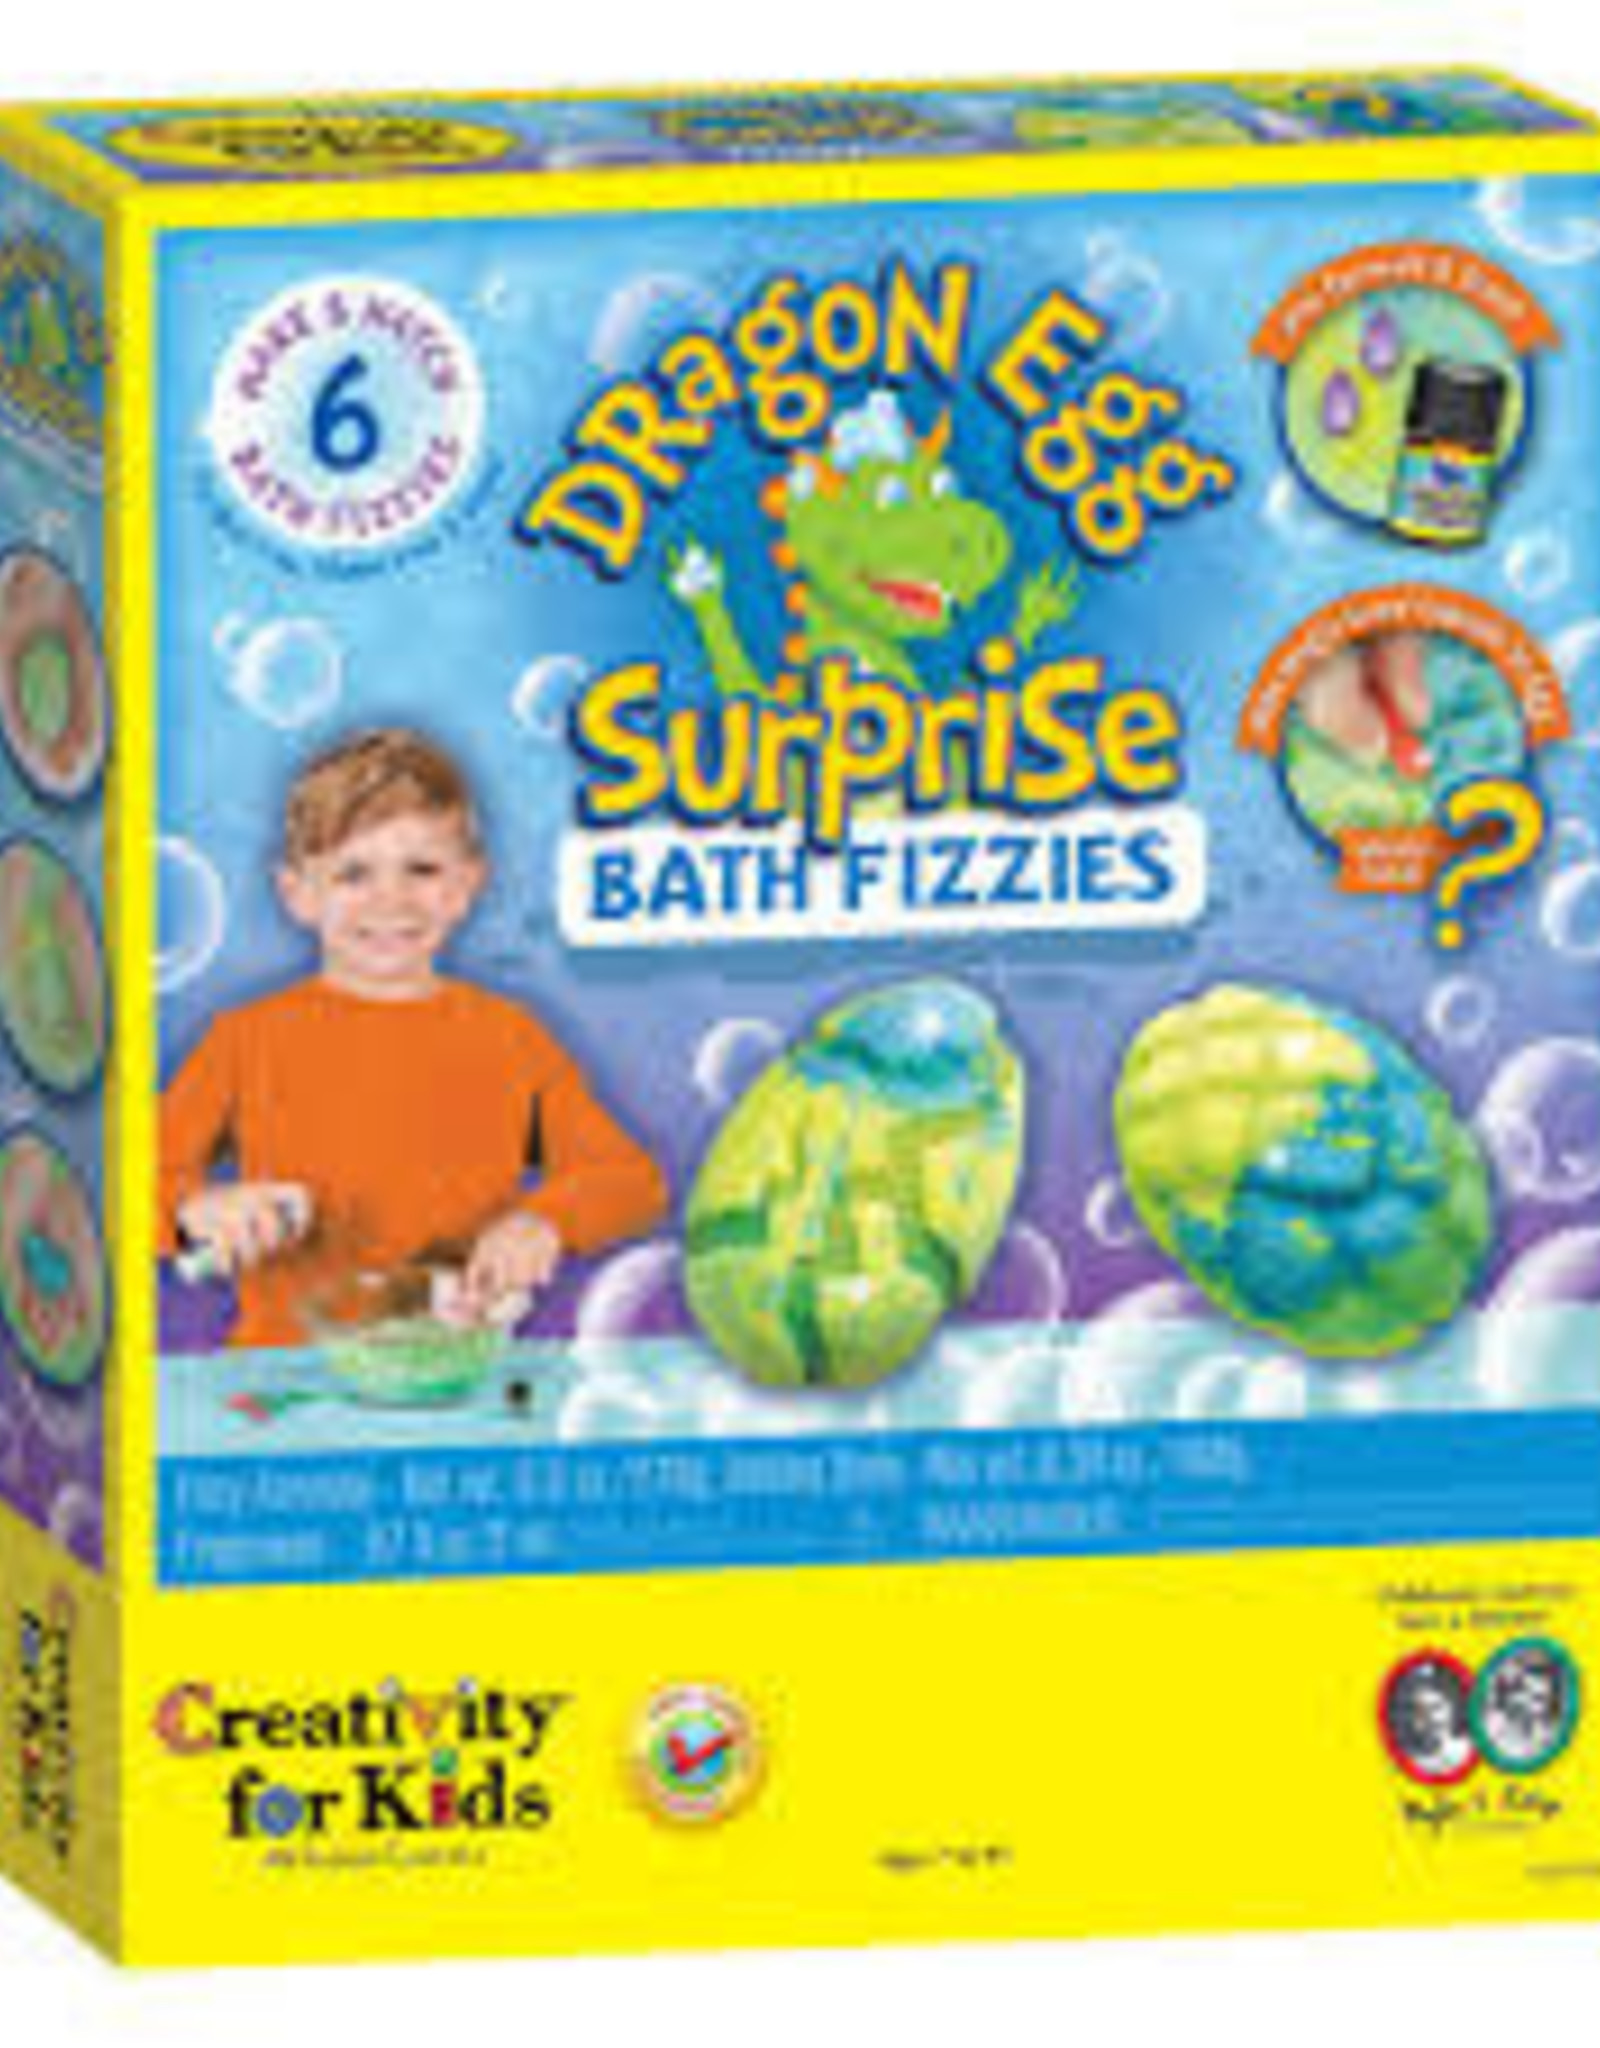 Faber-Castell Dragon Egg Bath Fizzies